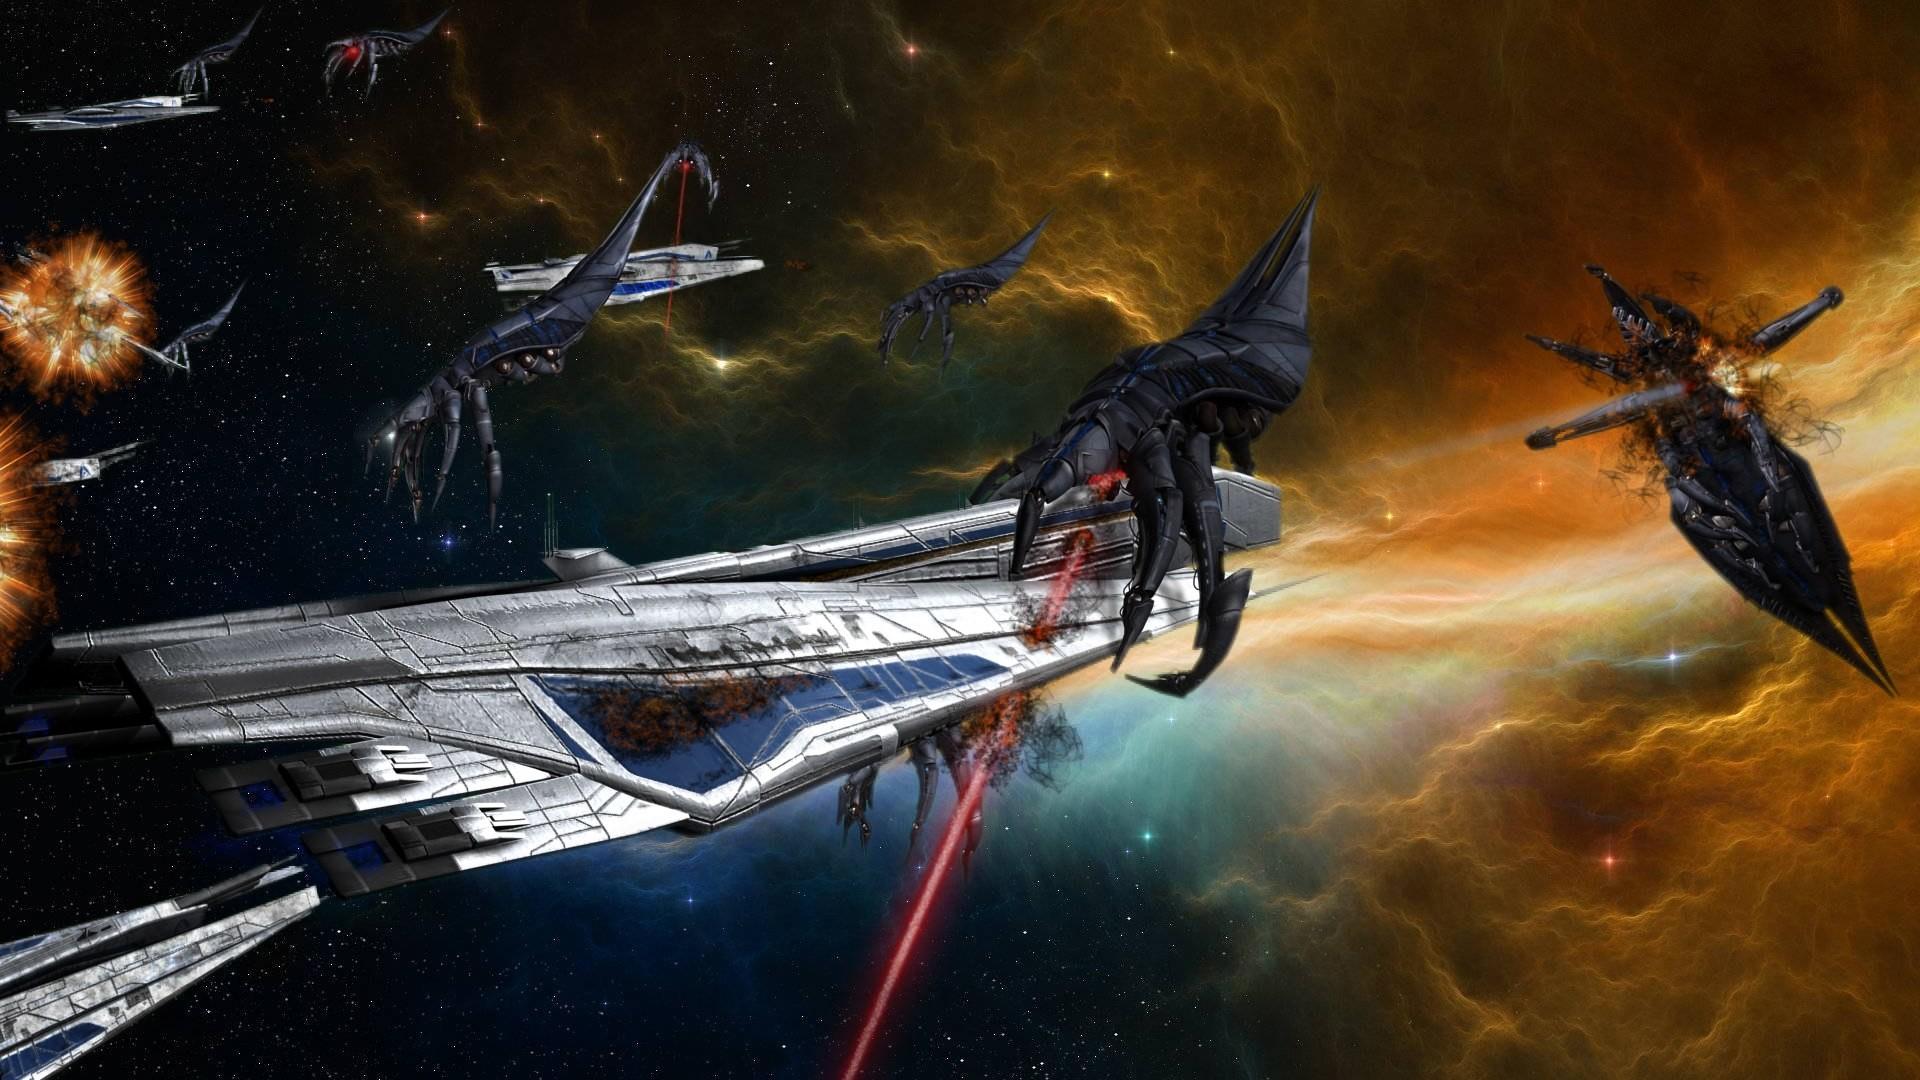 amazing scifi space battle HD wallpapers